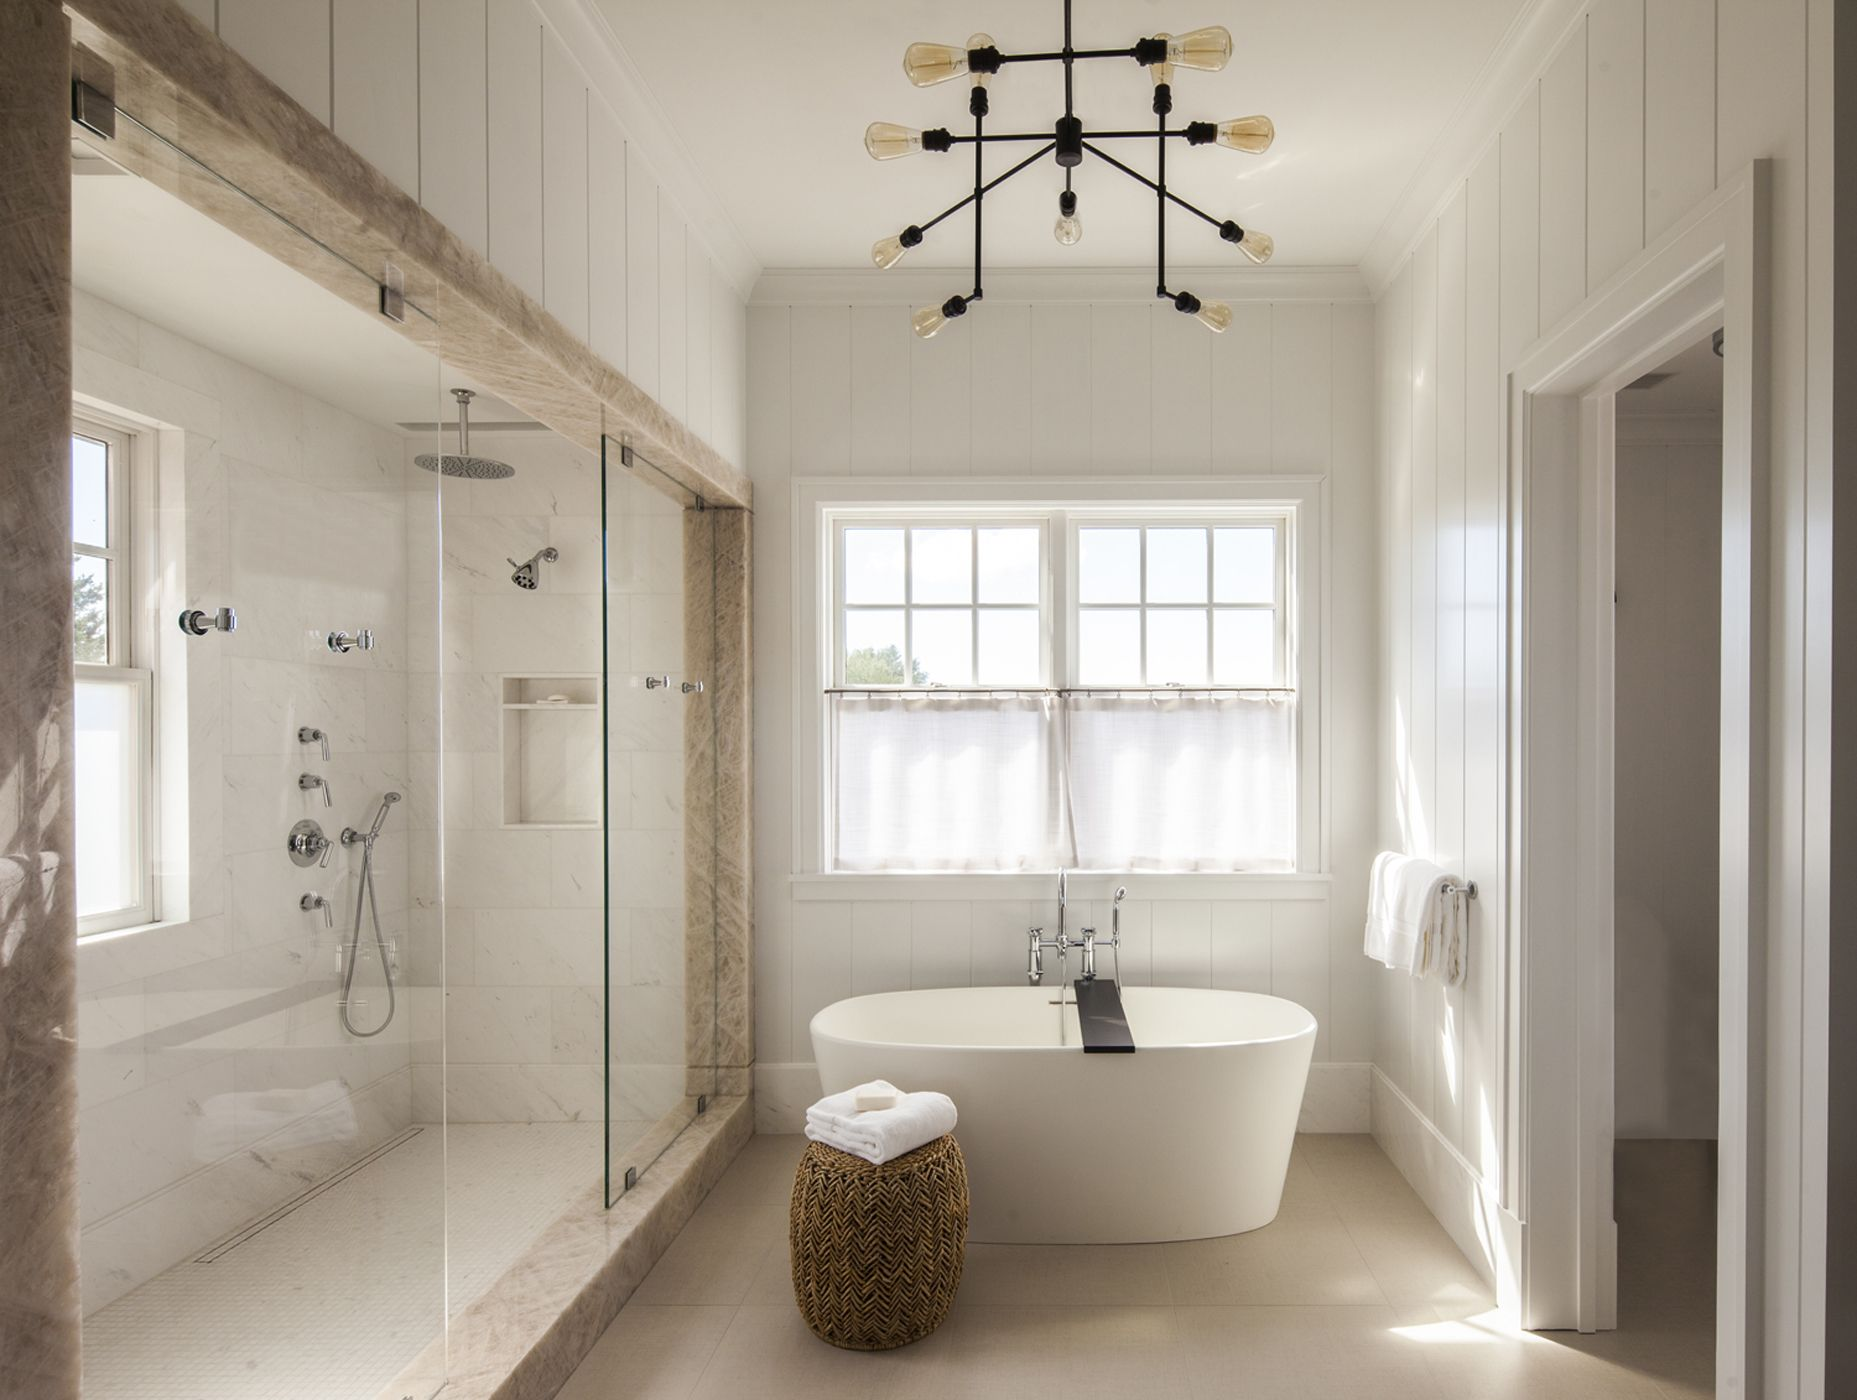 Elle Decor & 30 Perfect Bathrooms with Luxurious Curved Tubs - Round Bathtub Ideas